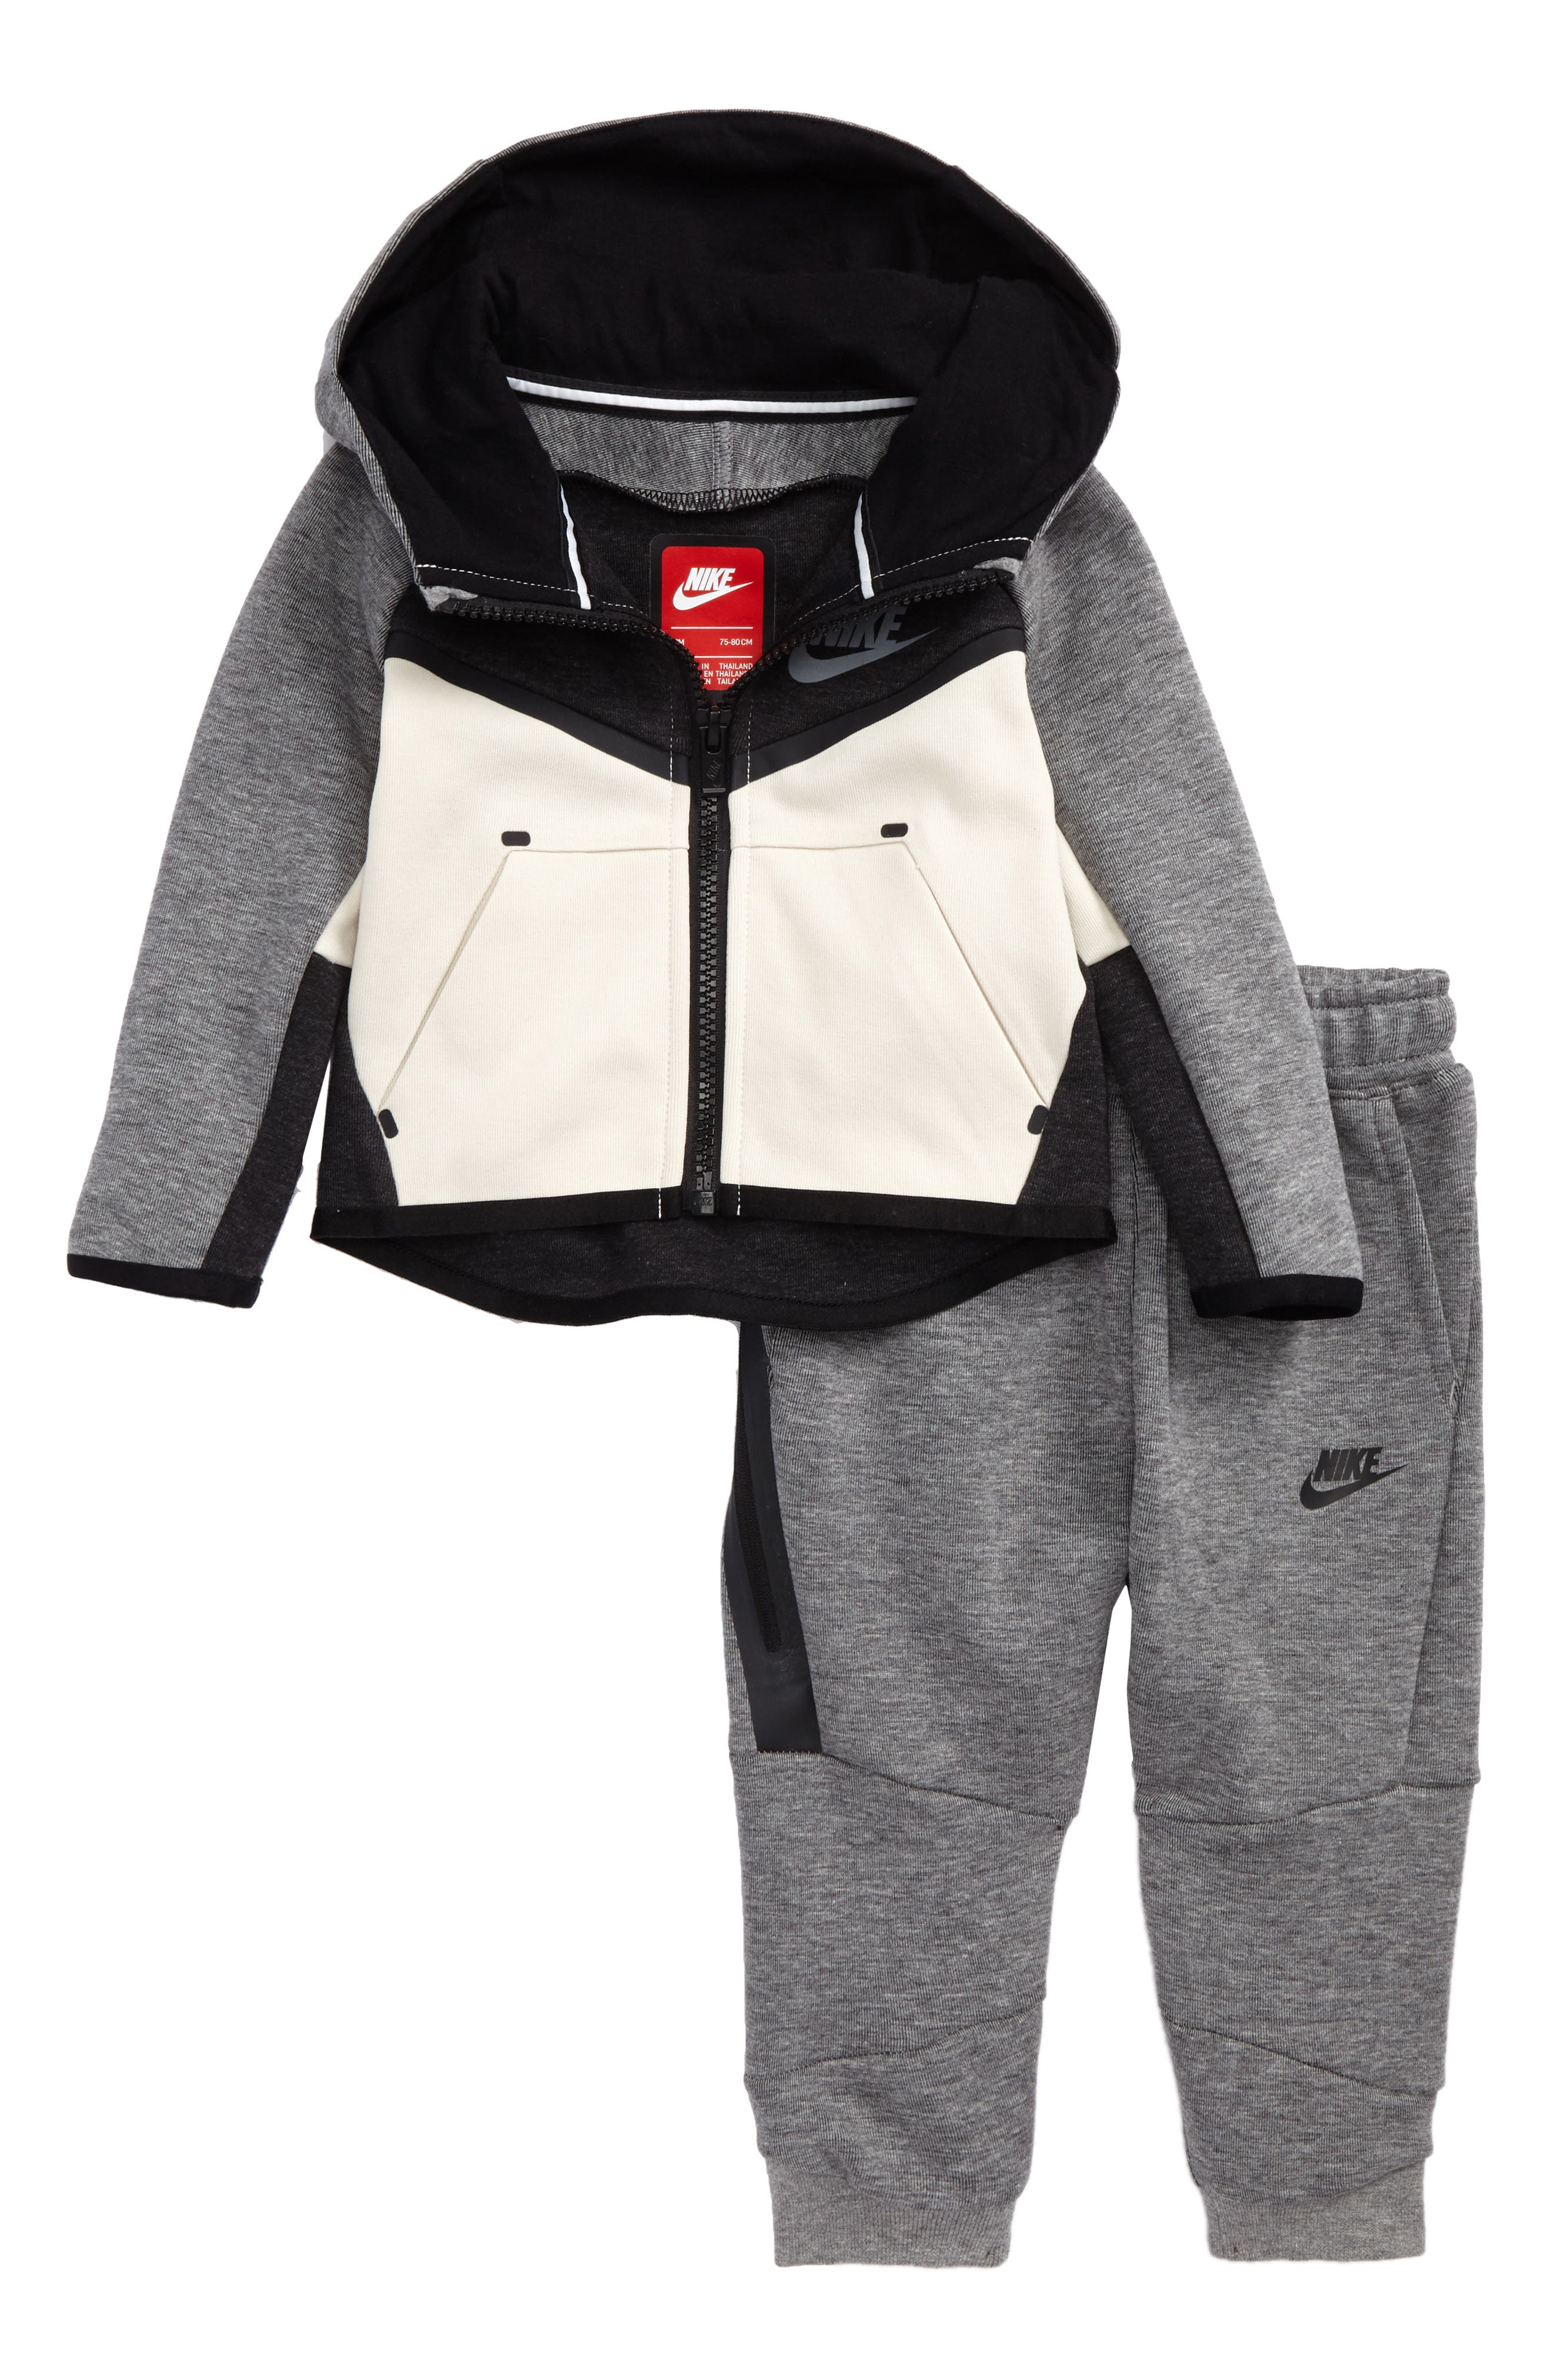 Infant Boys Nike Tech Fleece Hooded Jacket  Sweatpants Set